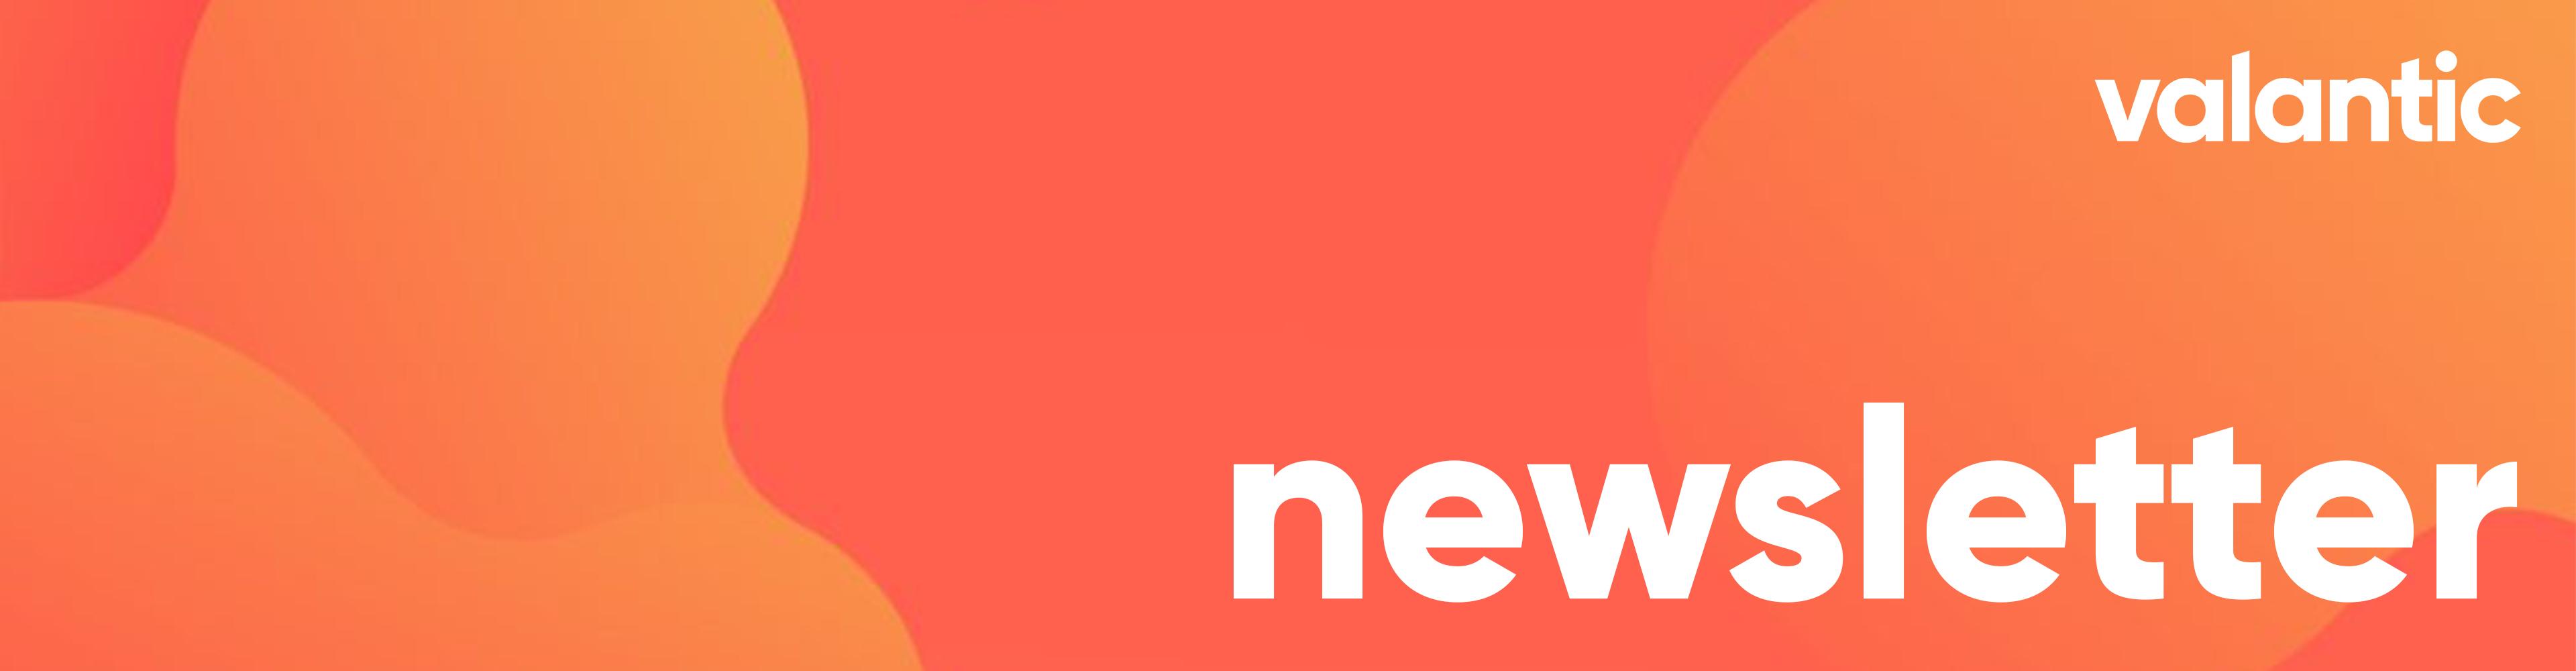 banner-interner-newsletter-valantic